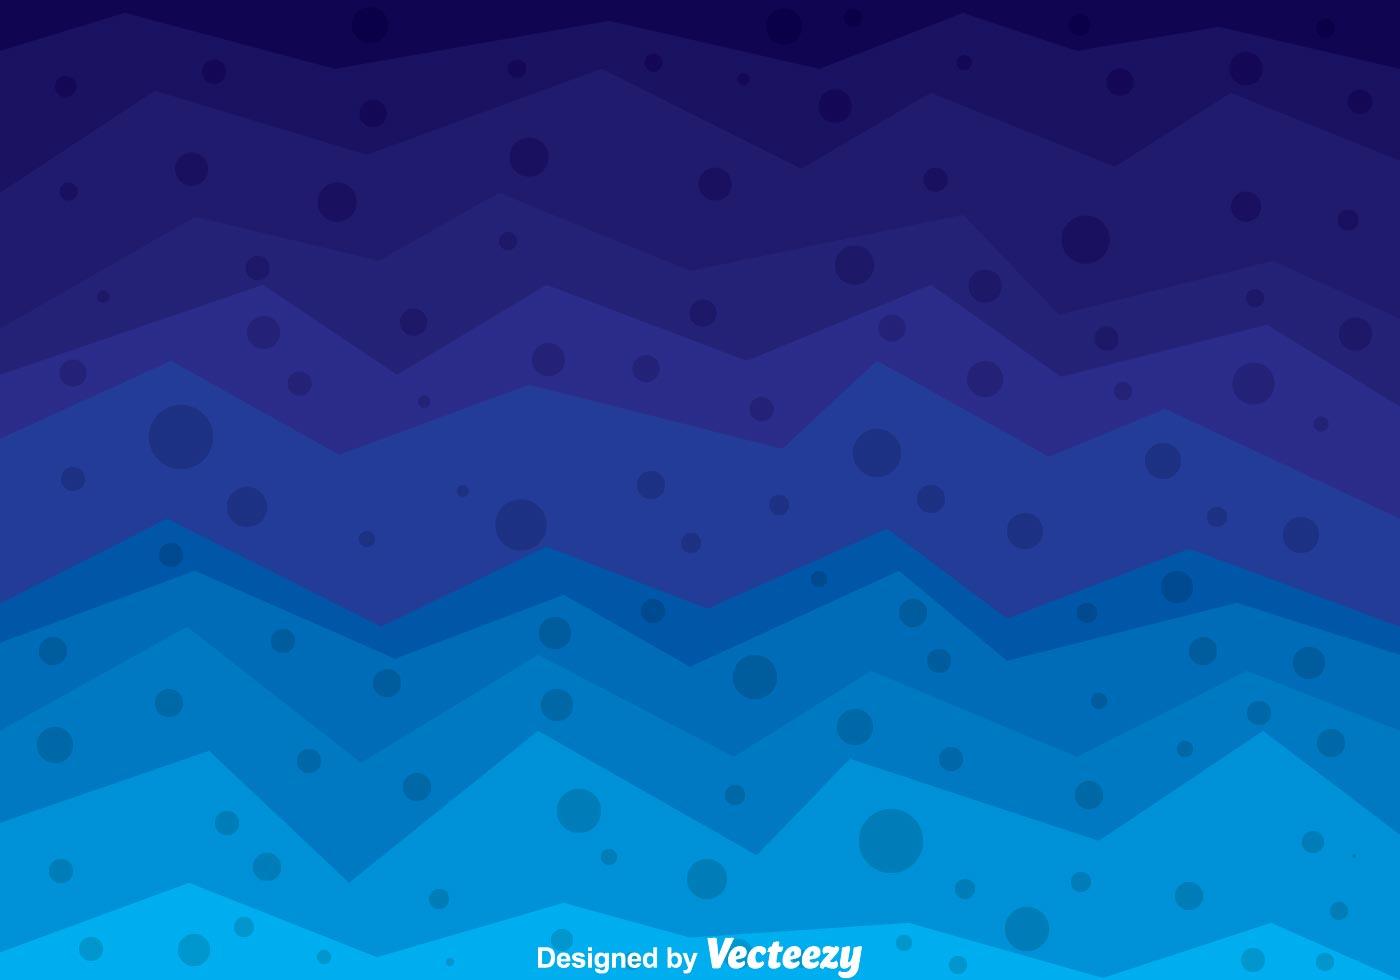 Black And White Geometric Wallpaper Blue Chevron Pattern Download Free Vector Art Stock